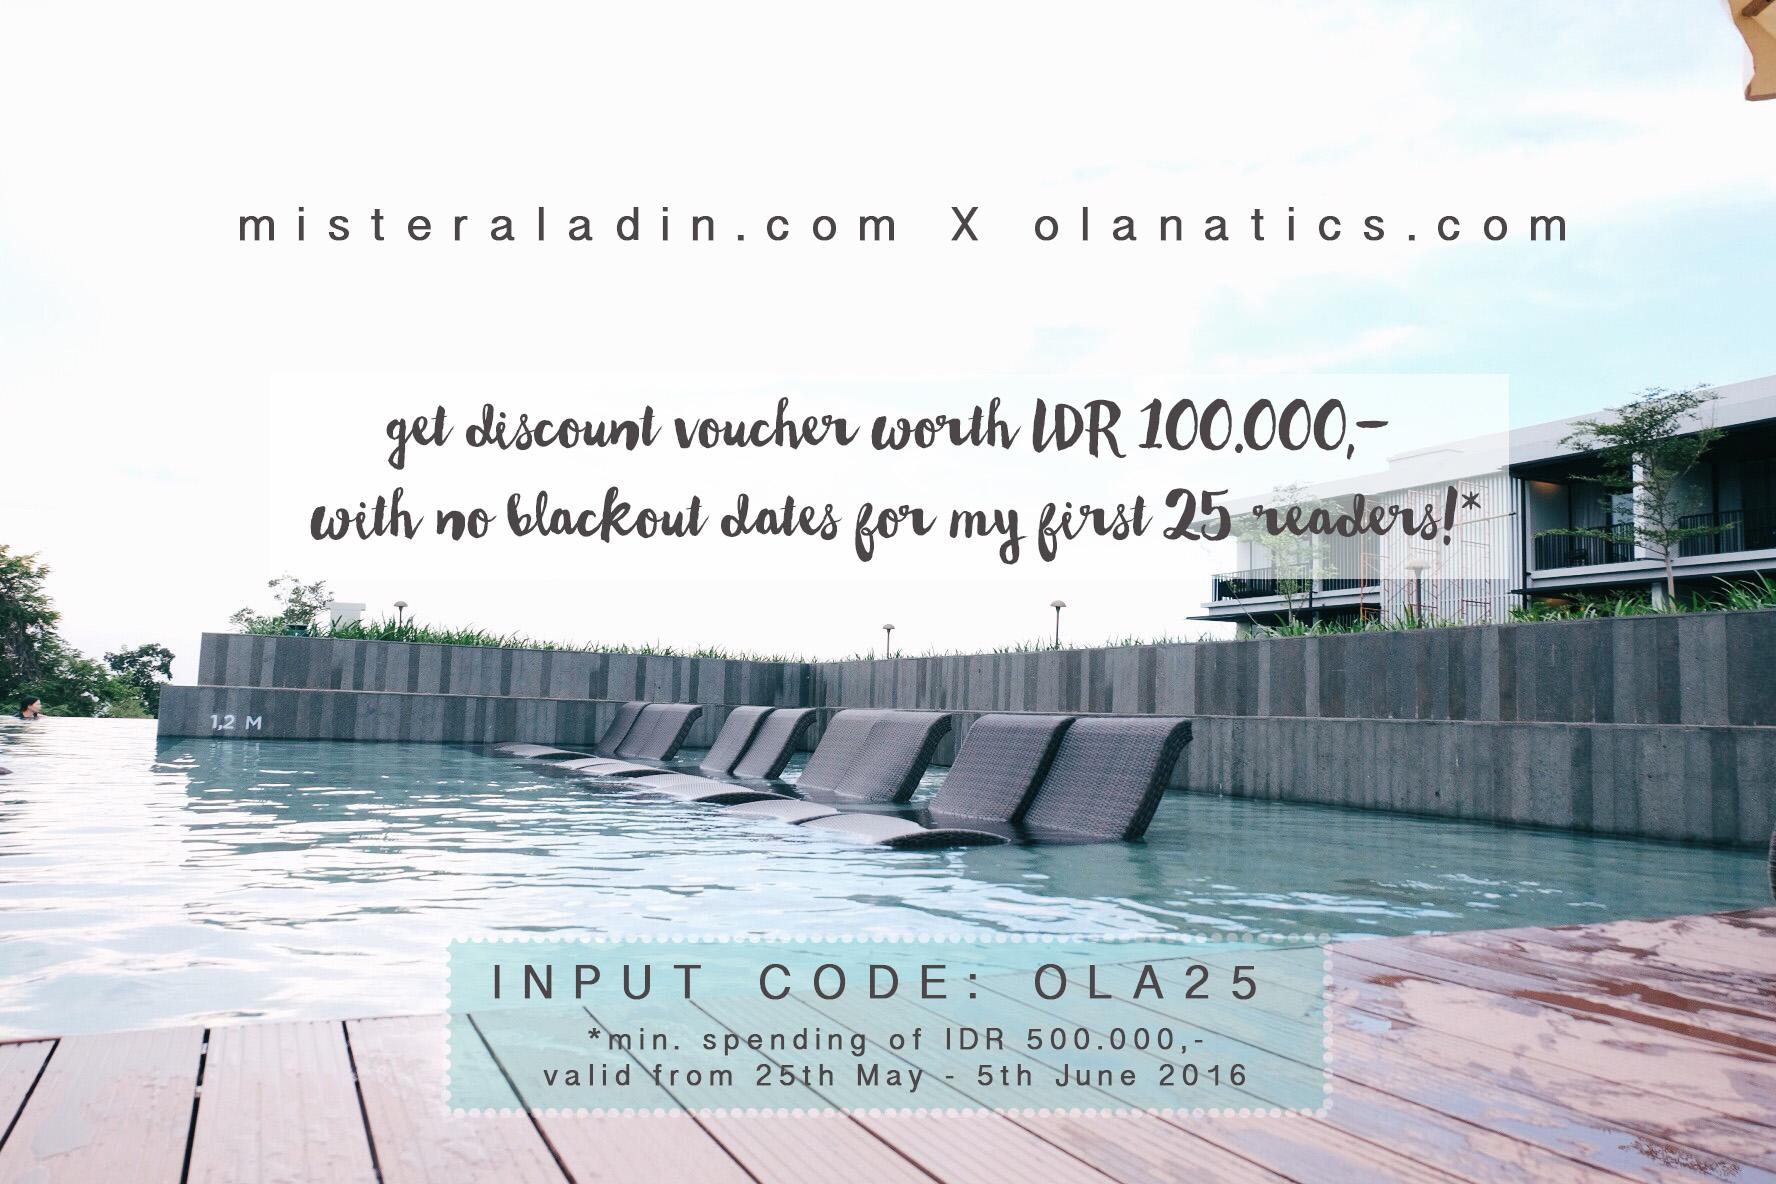 kode-booking-olanatics.com_ Liburan Gaya Kamu di MisterAladin.com